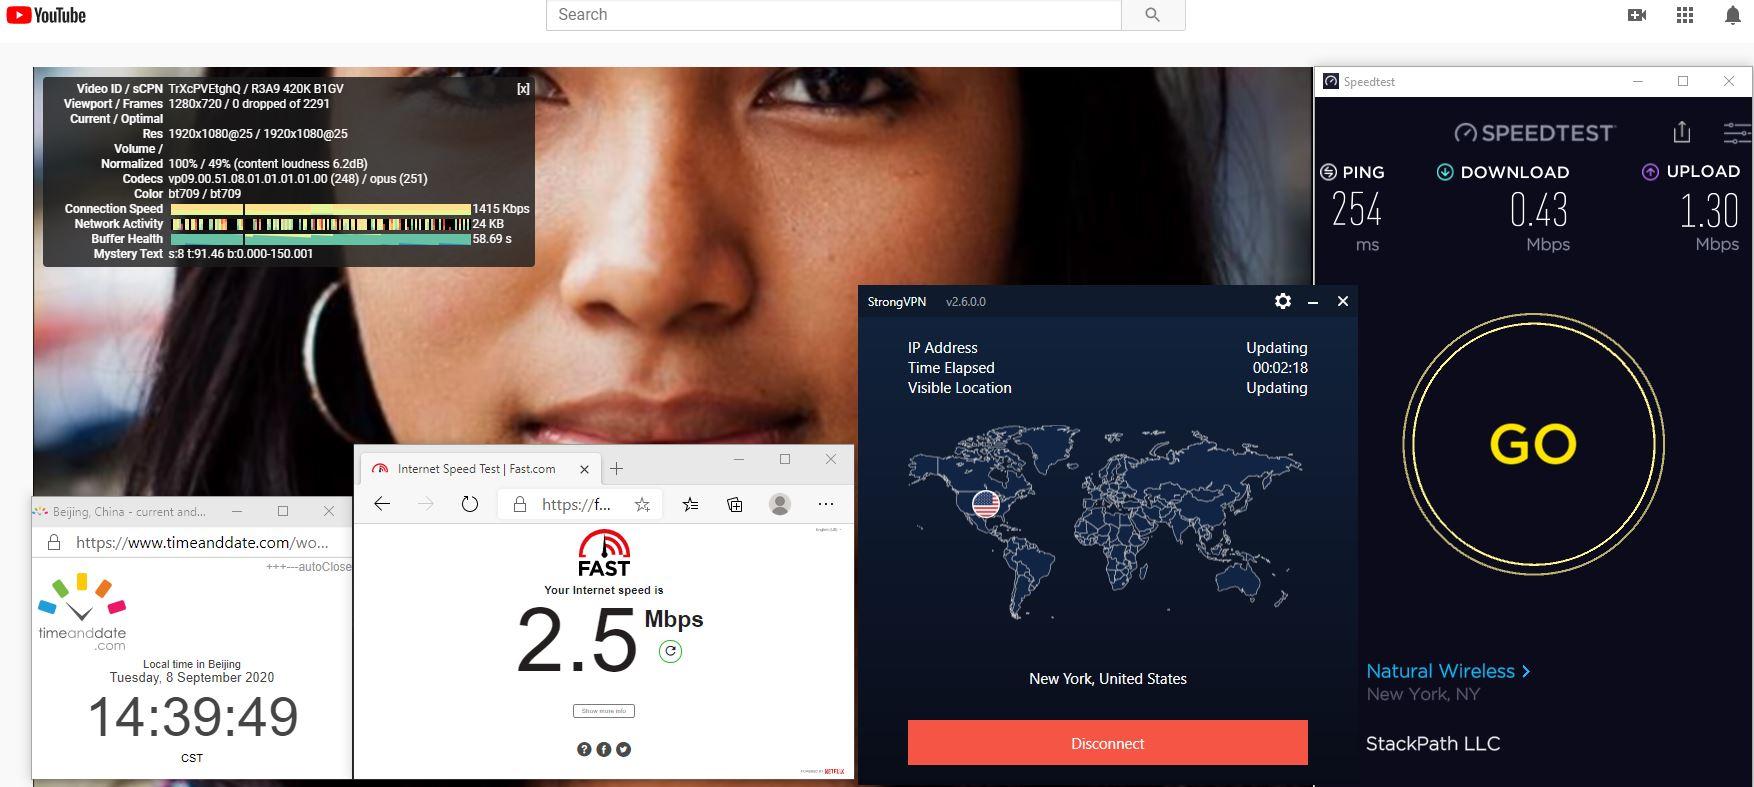 Windows10 StrongVPN USA - New York 中国VPN 翻墙 科学上网 翻墙速度测试 - 20200908